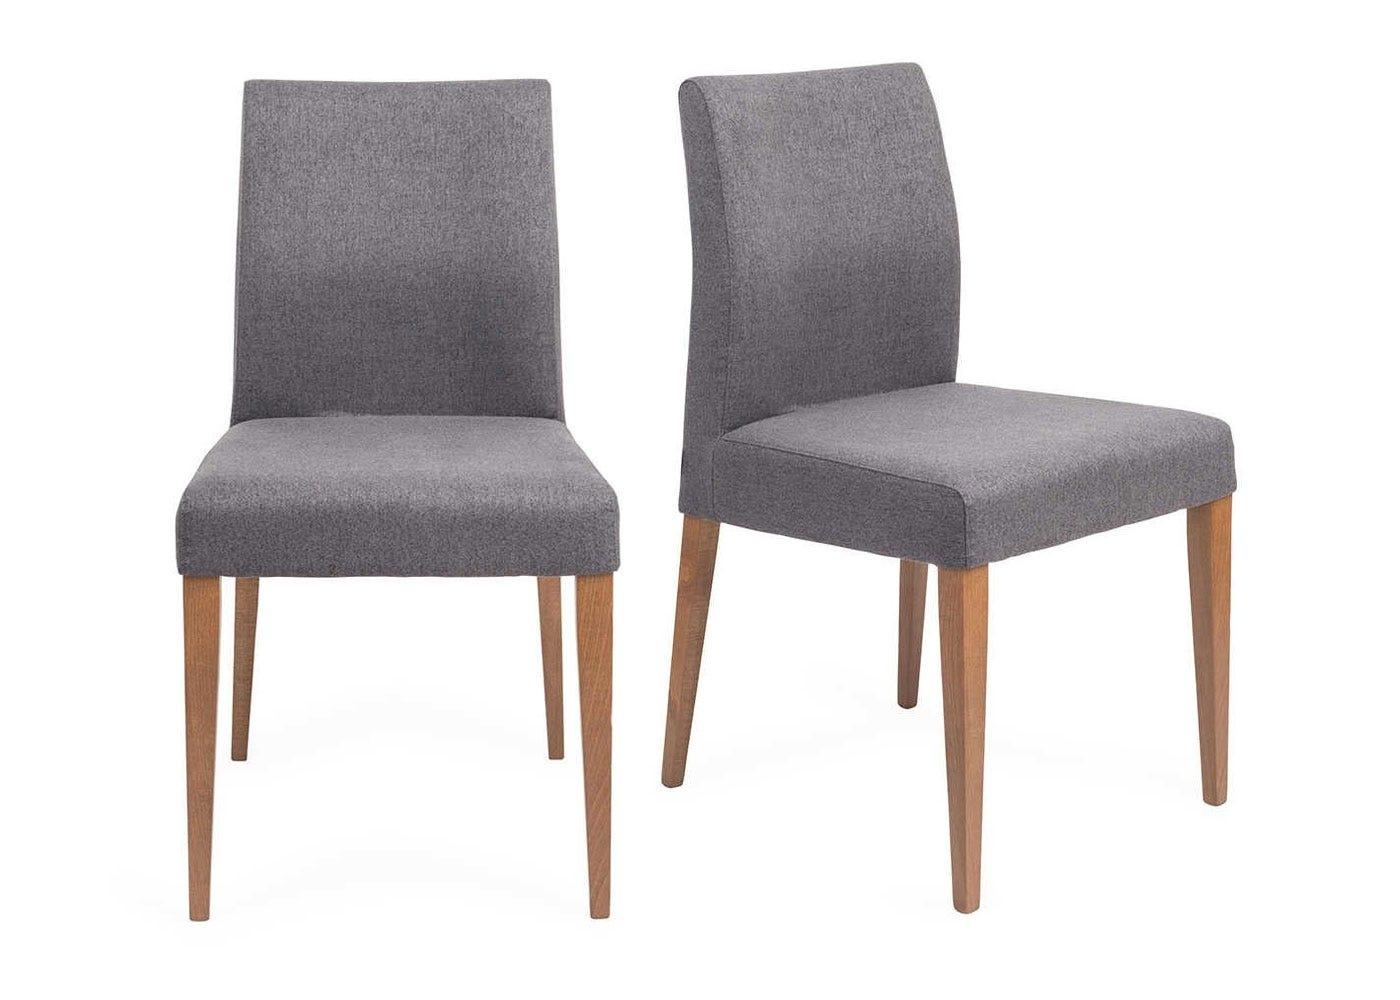 Hudson Pair of Dining Chairs Joshua Charcoal Dark Stain Legs